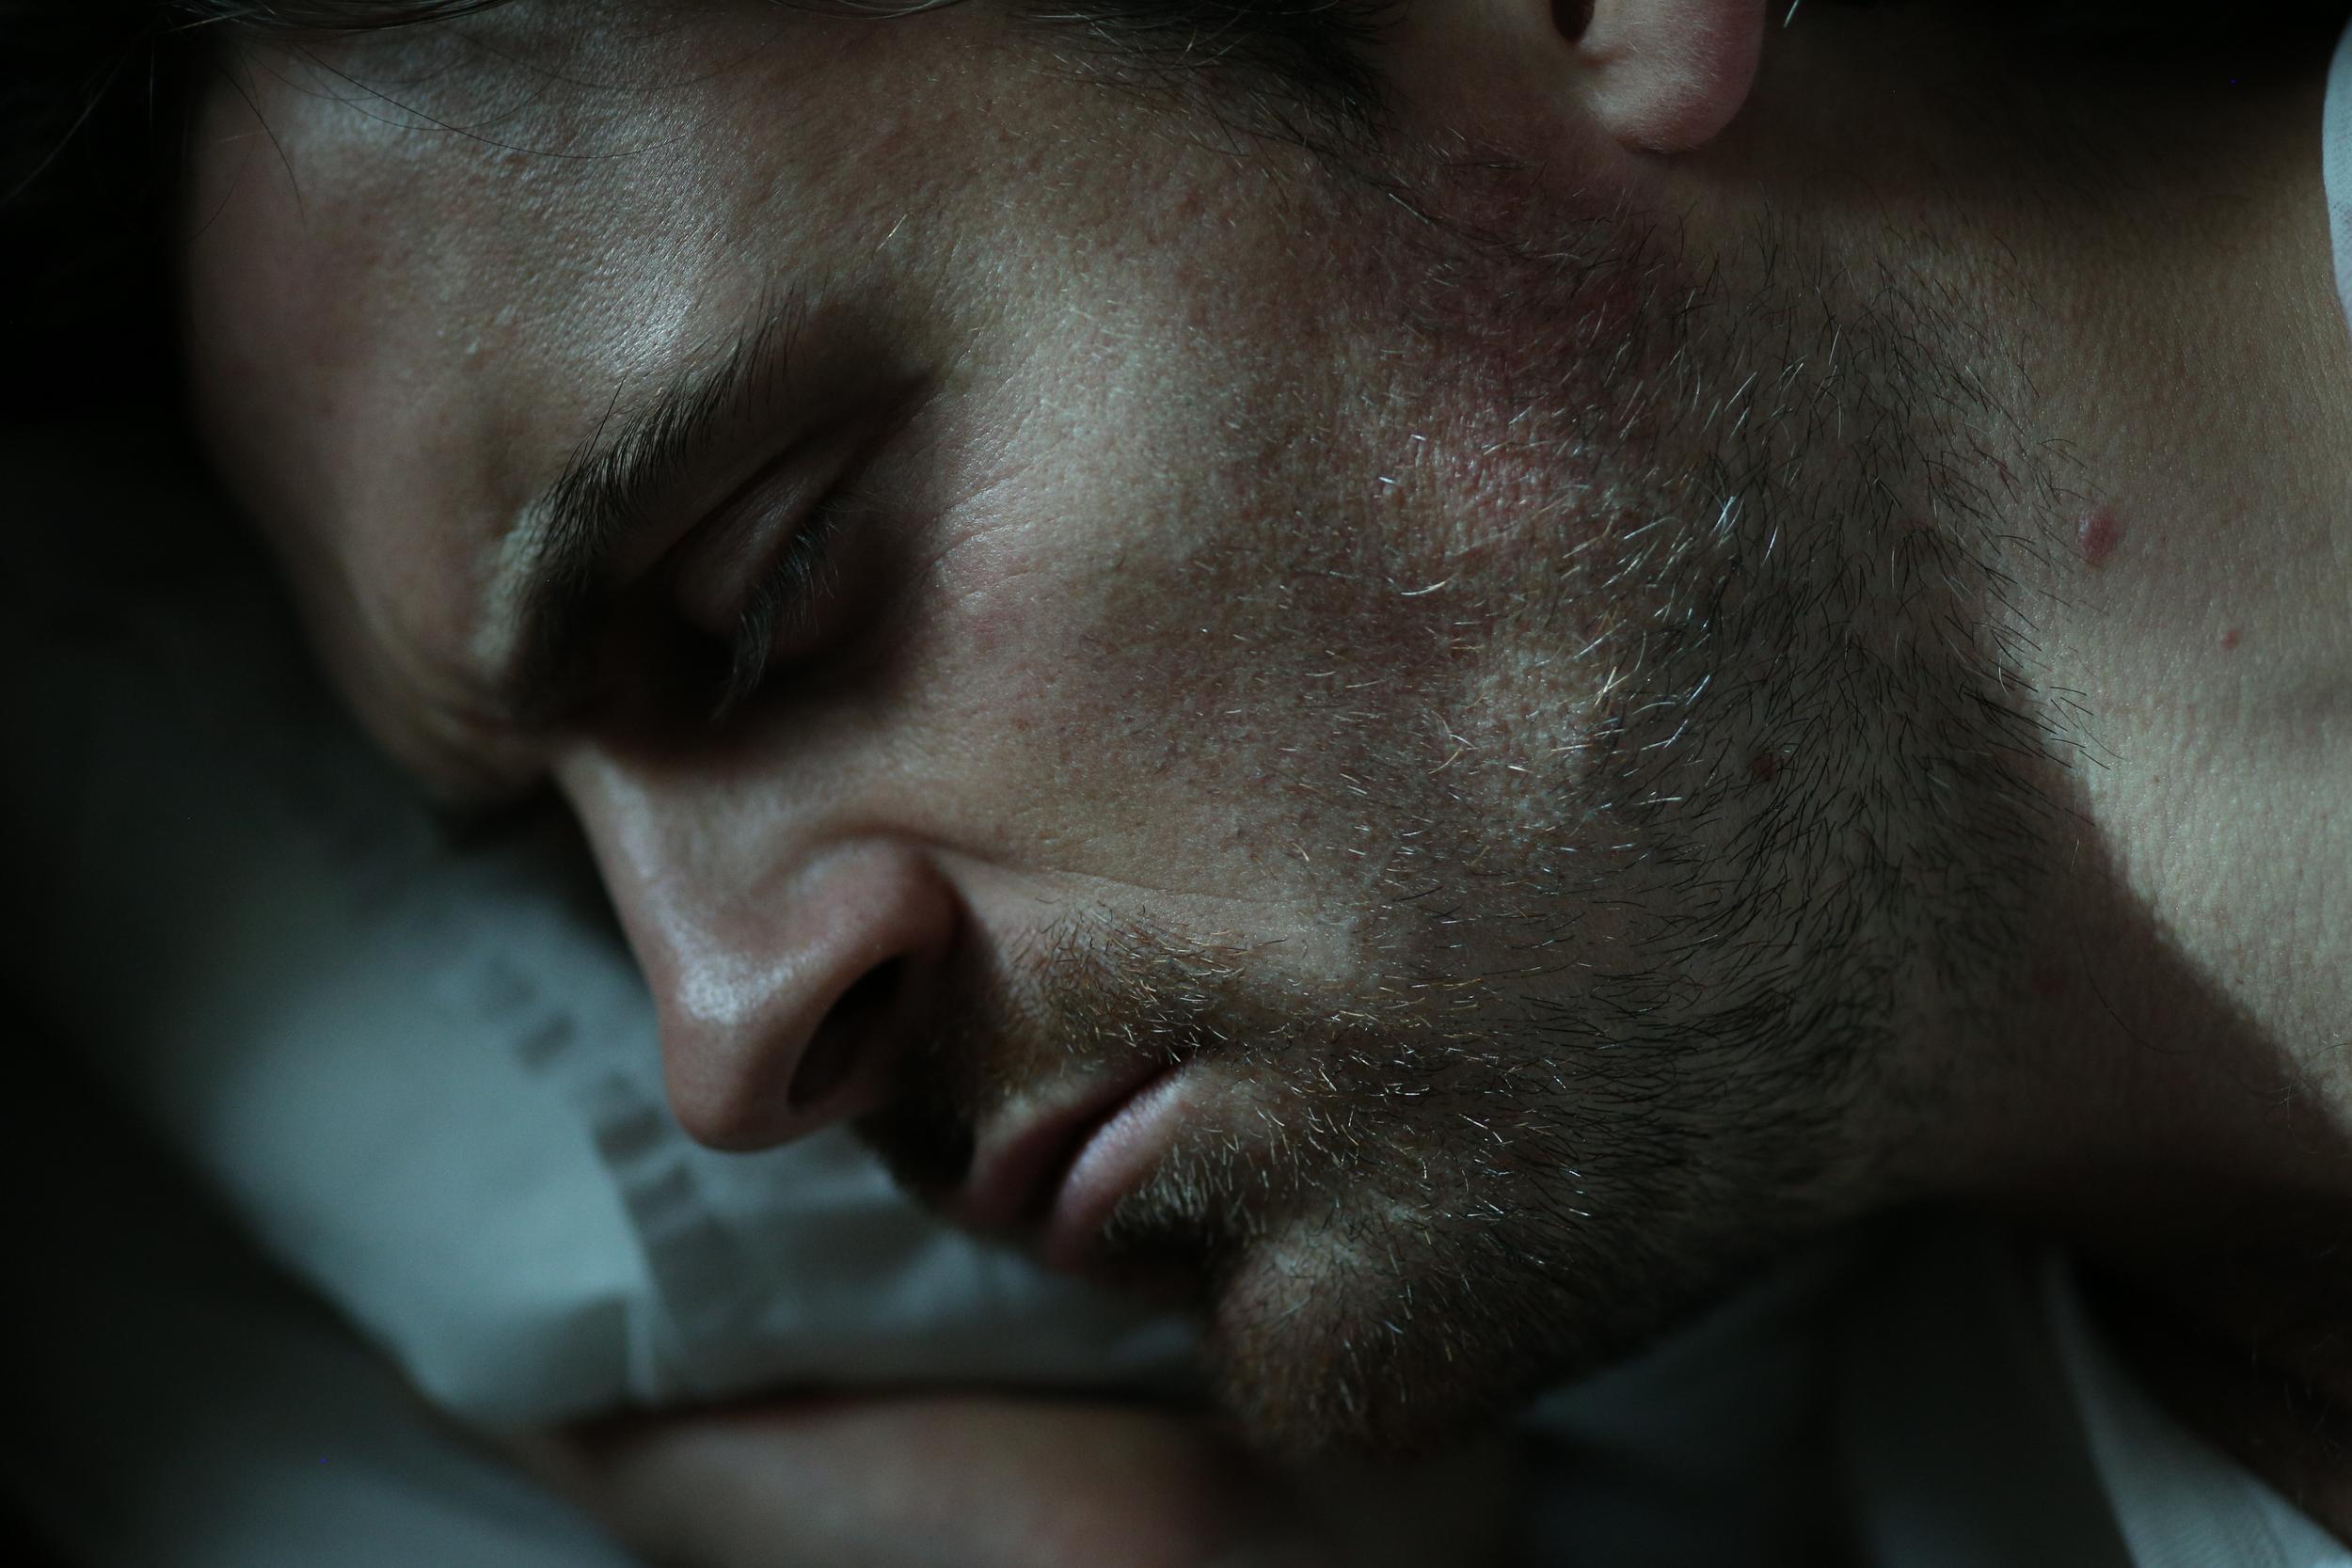 Alex Ellis as Henry Chambers in Grind, copyright Alex Kryszkiewicz